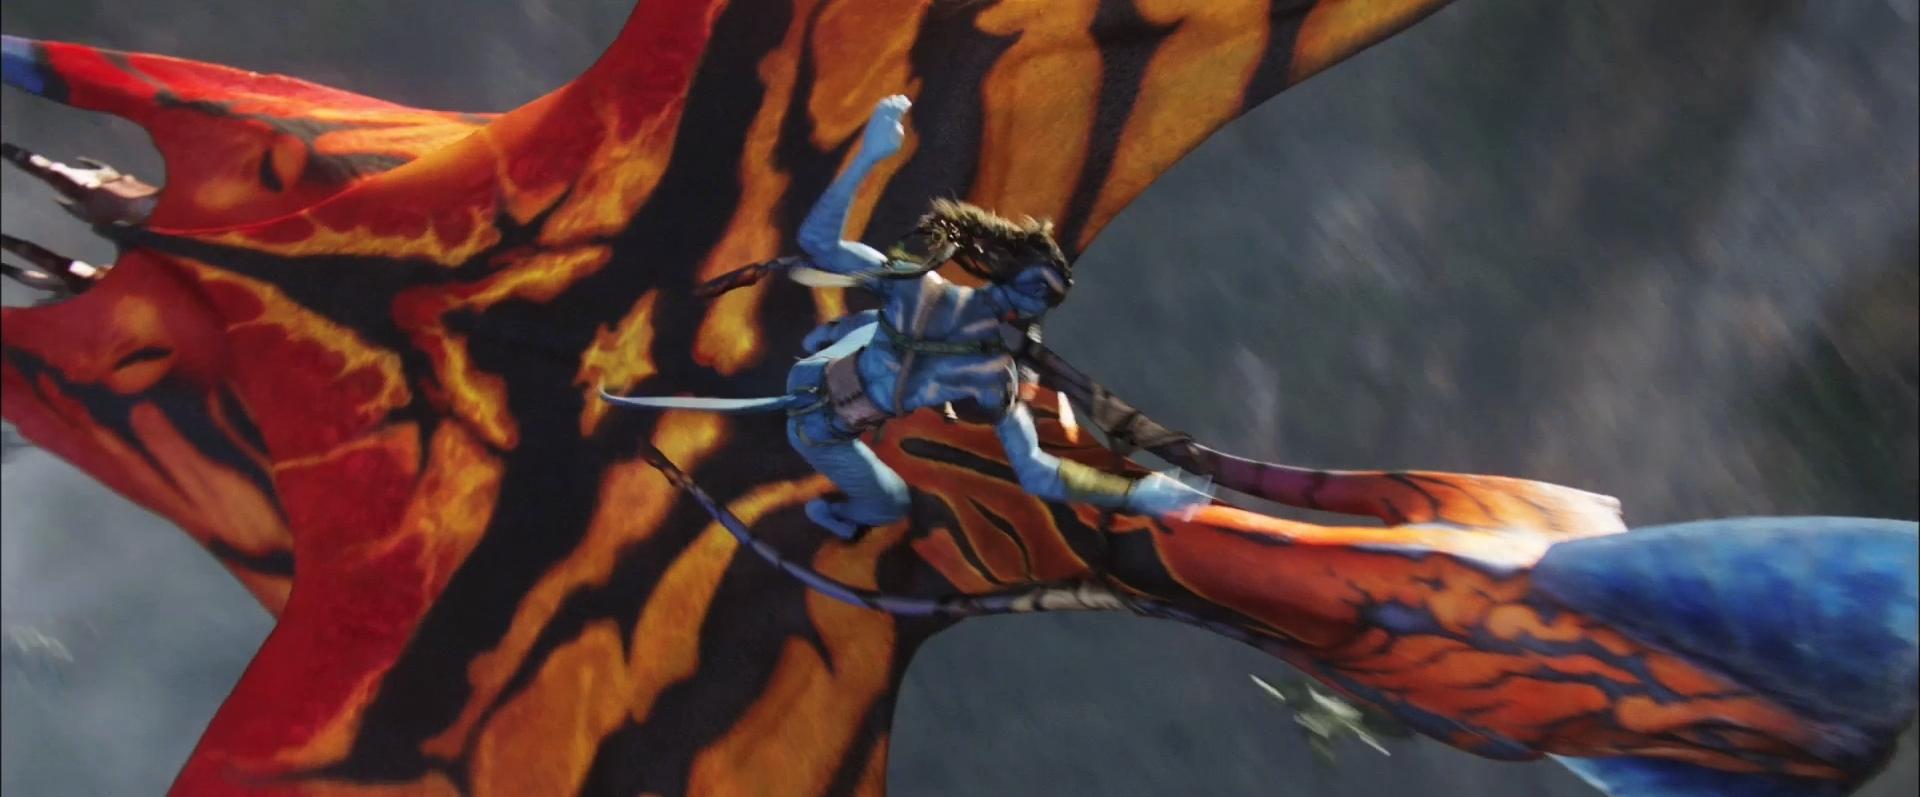 Avatar avatar trailer 2 hd screencaps